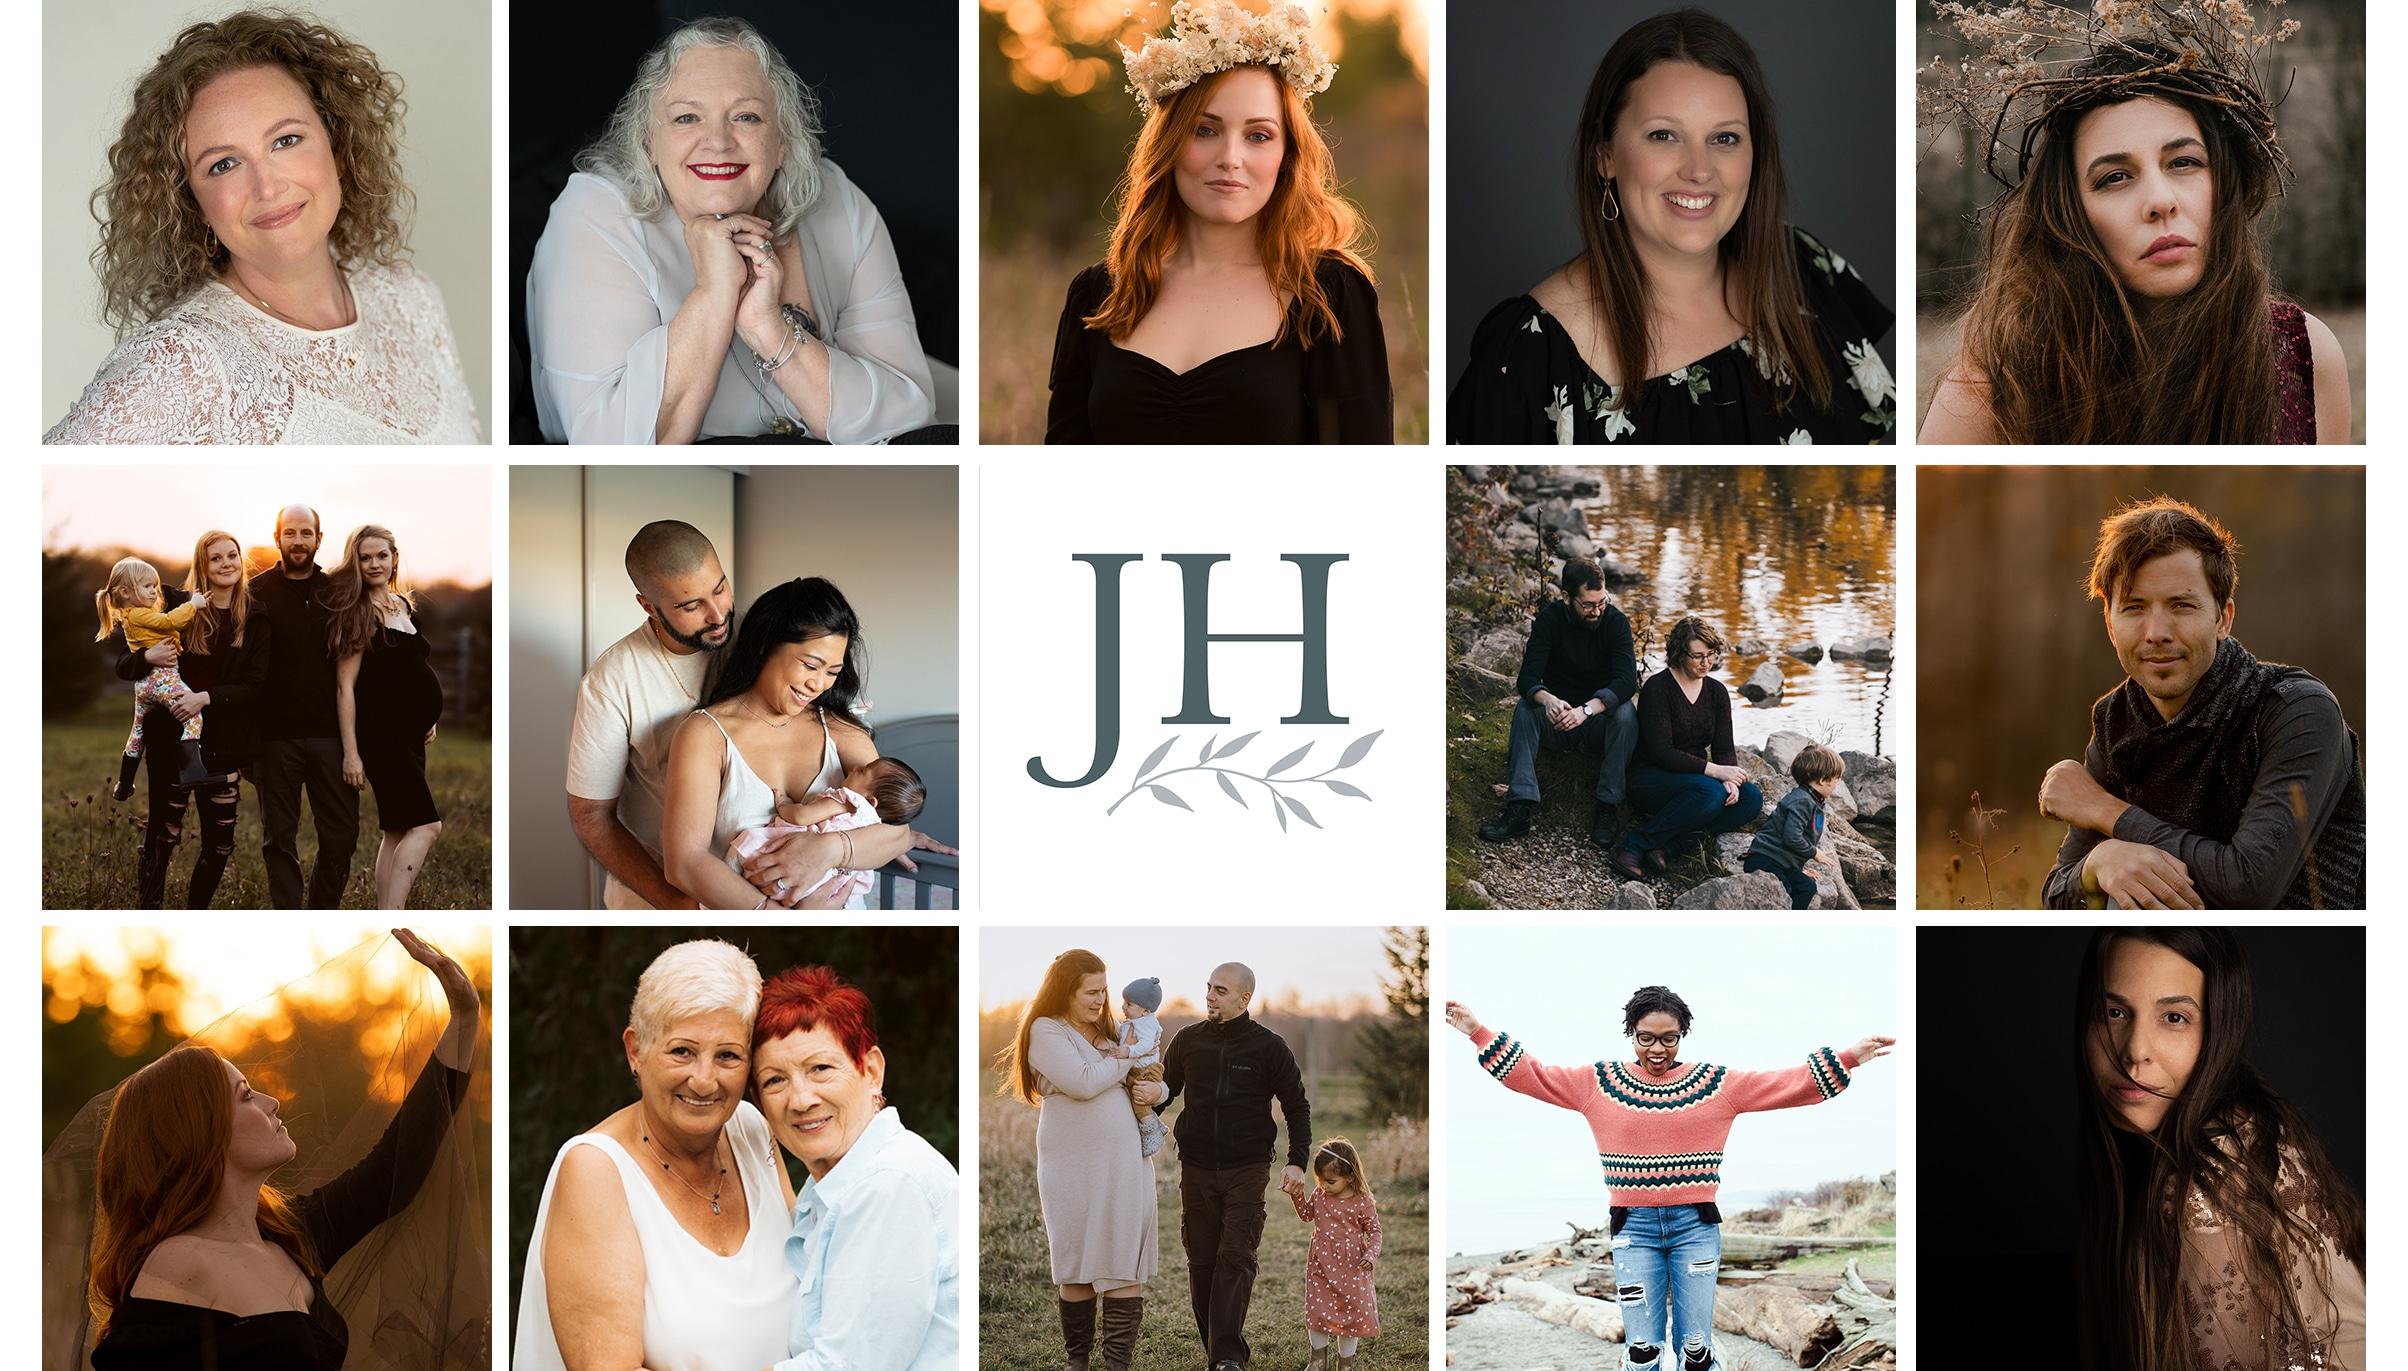 Award winning Hanover Ontario photographer Jennifer Hibberd